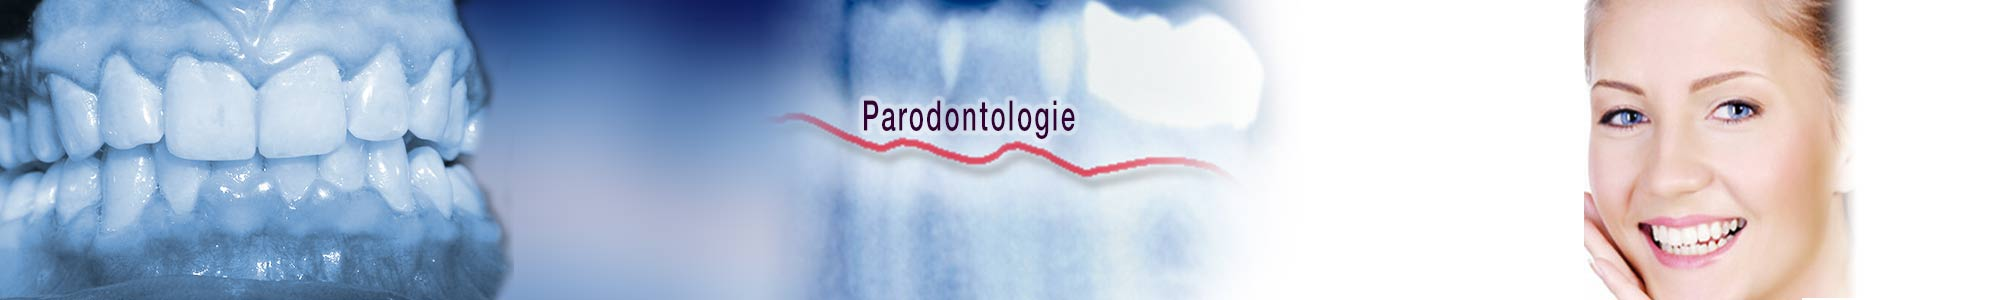 slide-parodontie-1